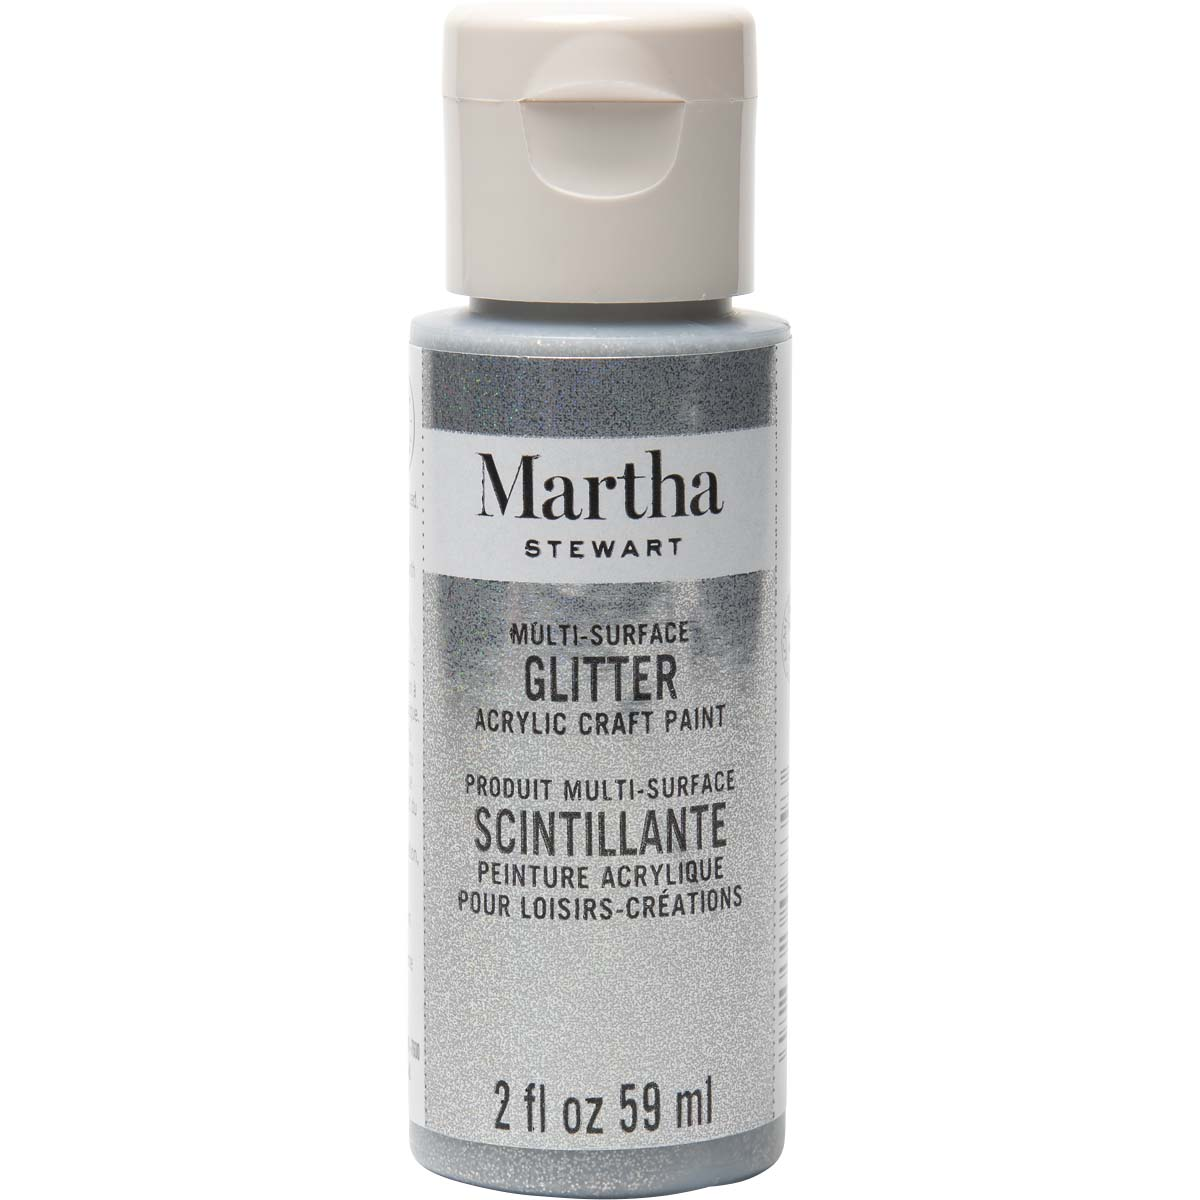 Martha Stewart ® Multi-Surface Glitter Acrylic Craft Paint - Sterling, 2 oz. - 32181CA